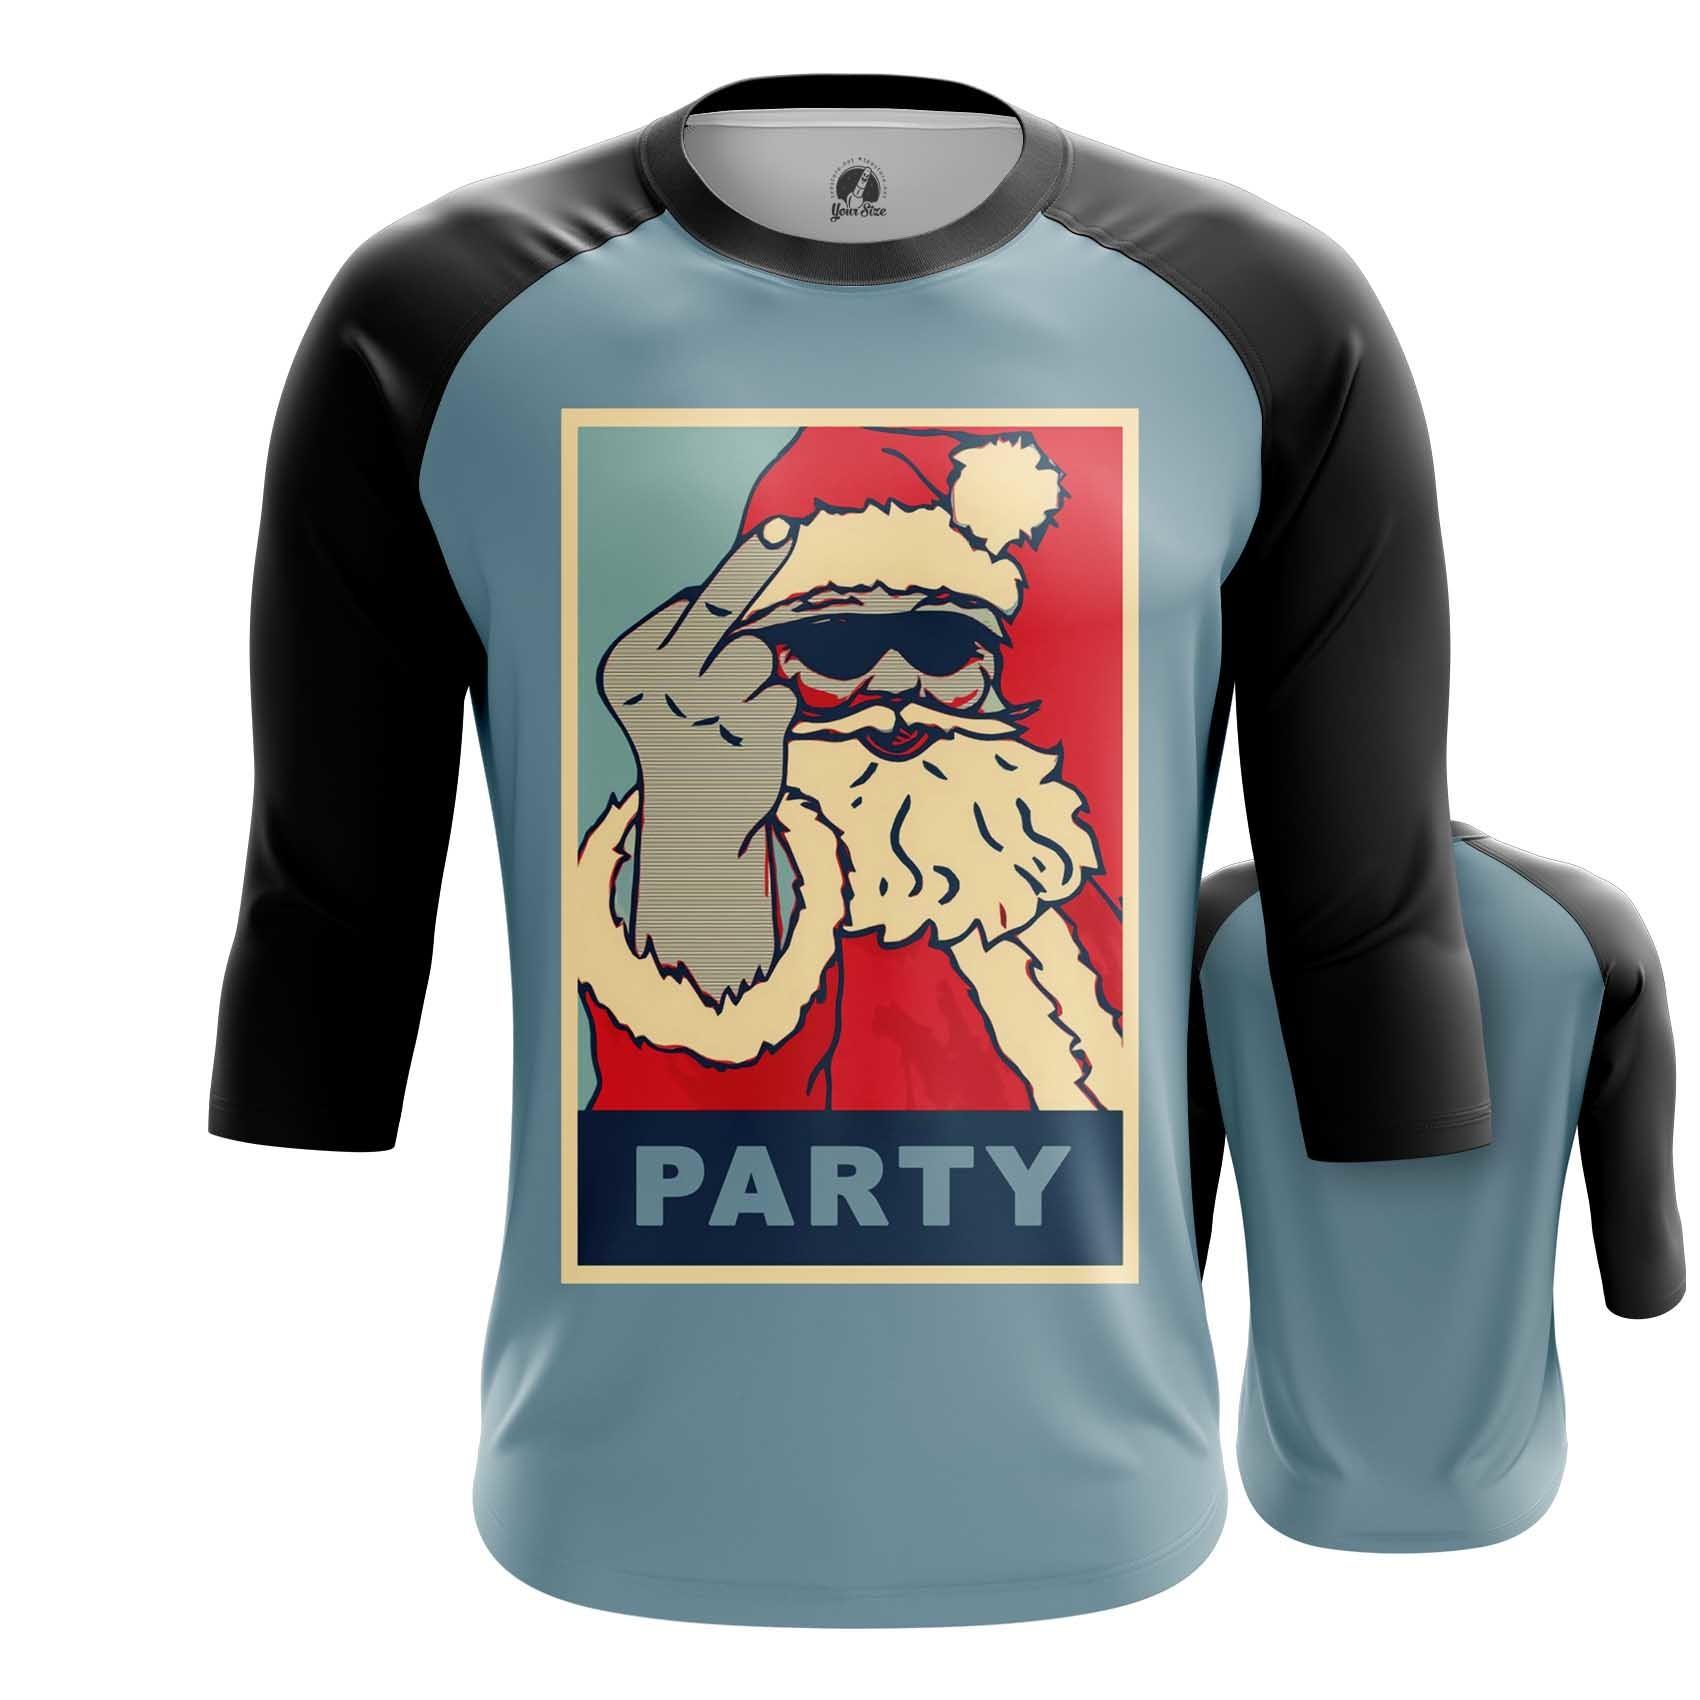 Merch T-Shirt Santa Claus Party Christmas Pop Art